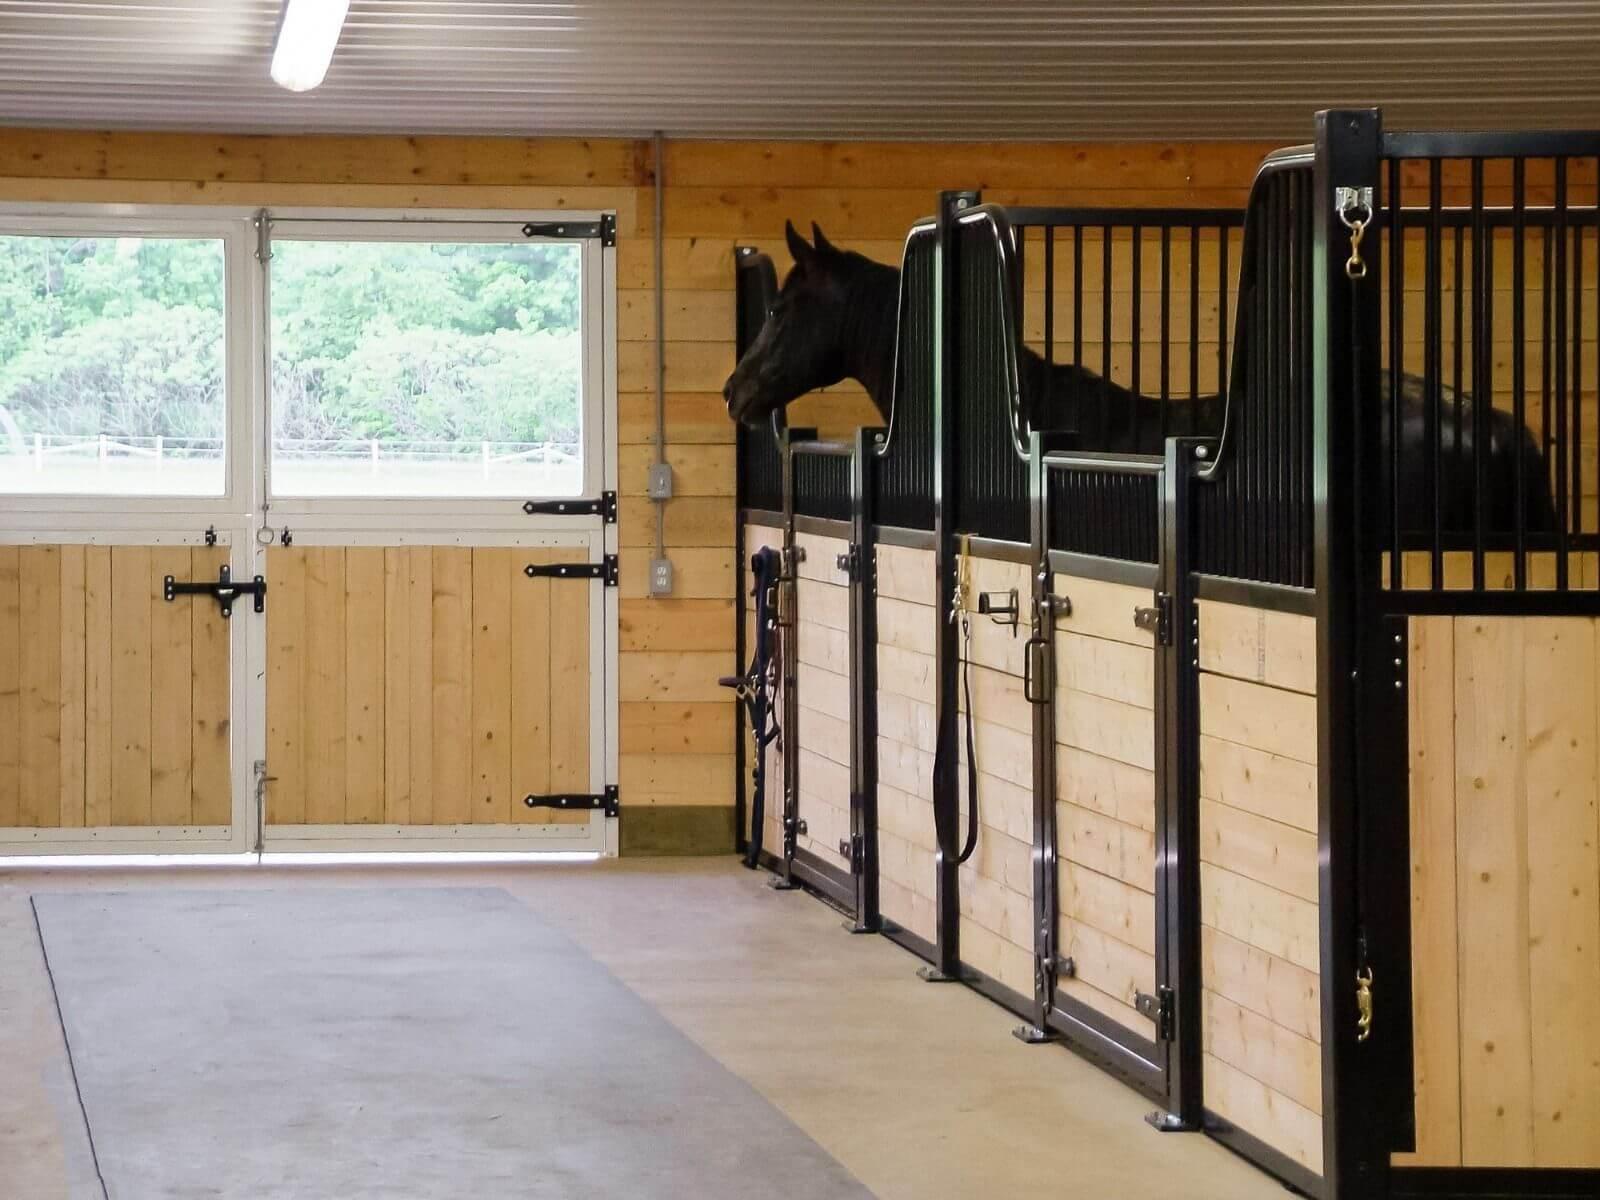 horse-barn-double-dutch-door-white-wood-iron-grip-latch-window